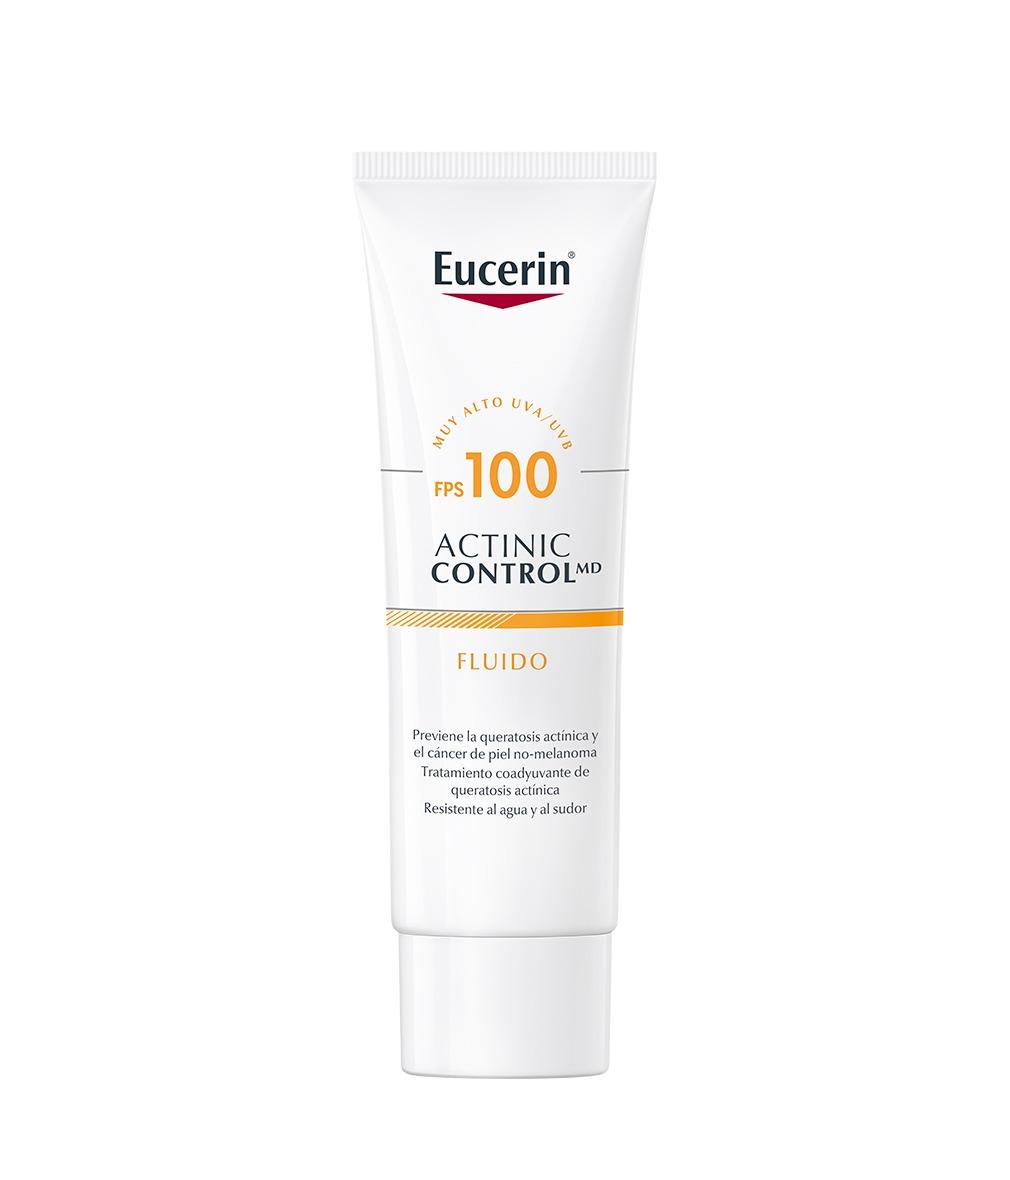 Eucerin Actinic Control Sun Lotion SPF100 80ml